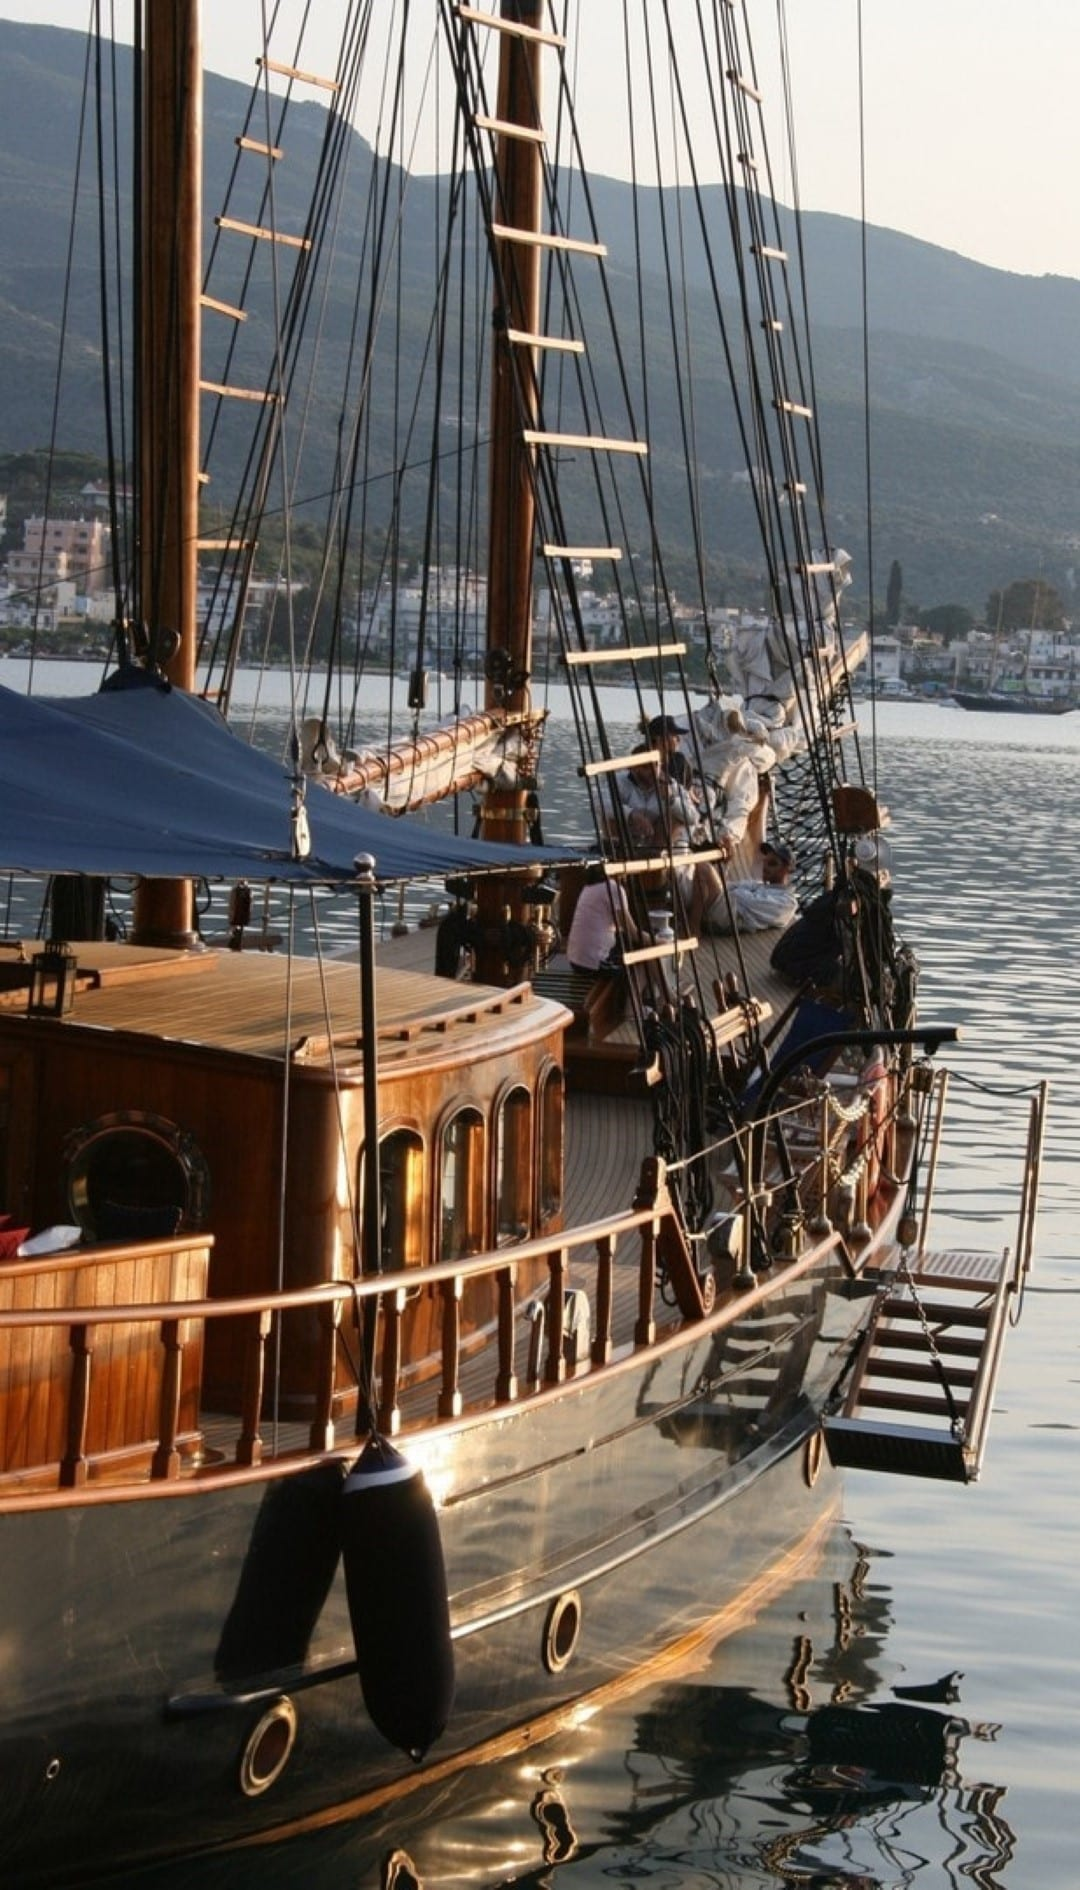 prince motor sailer swim ladder -  Valef Yachts Chartering - 0889